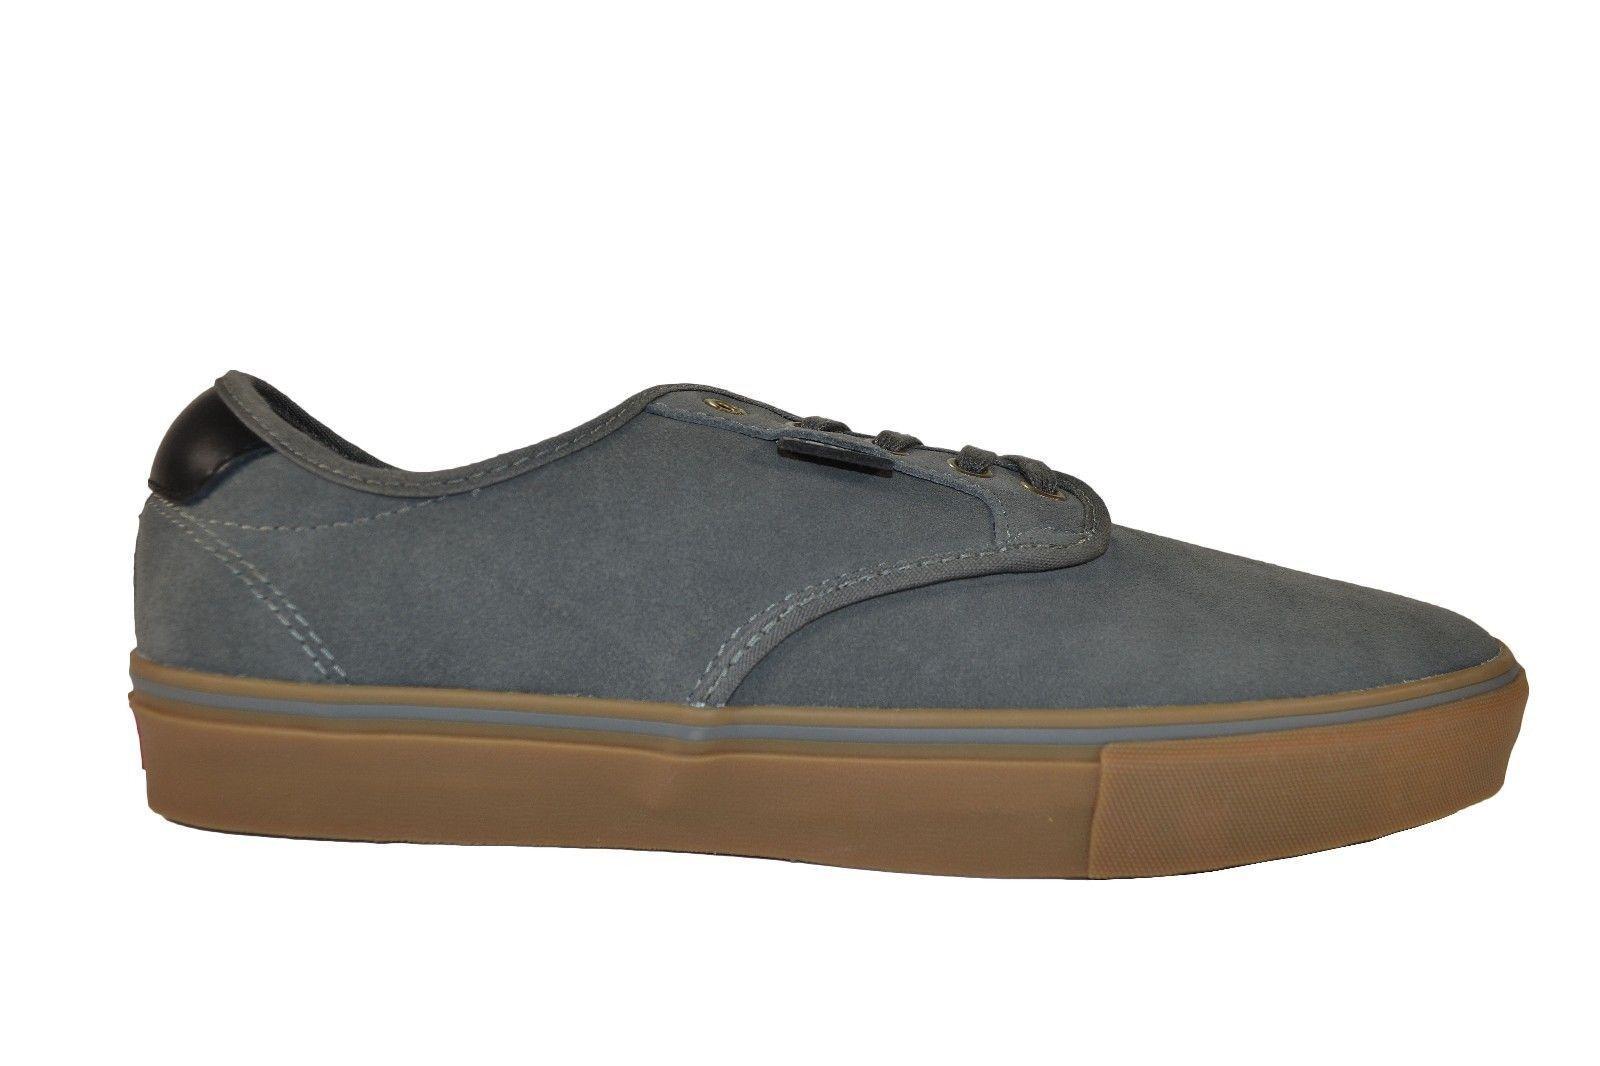 Vans CHIMA Skateboarding FERGUSON PRO Charcoal Gum Skateboarding CHIMA Discounted (503) Men's Shoes 434a50